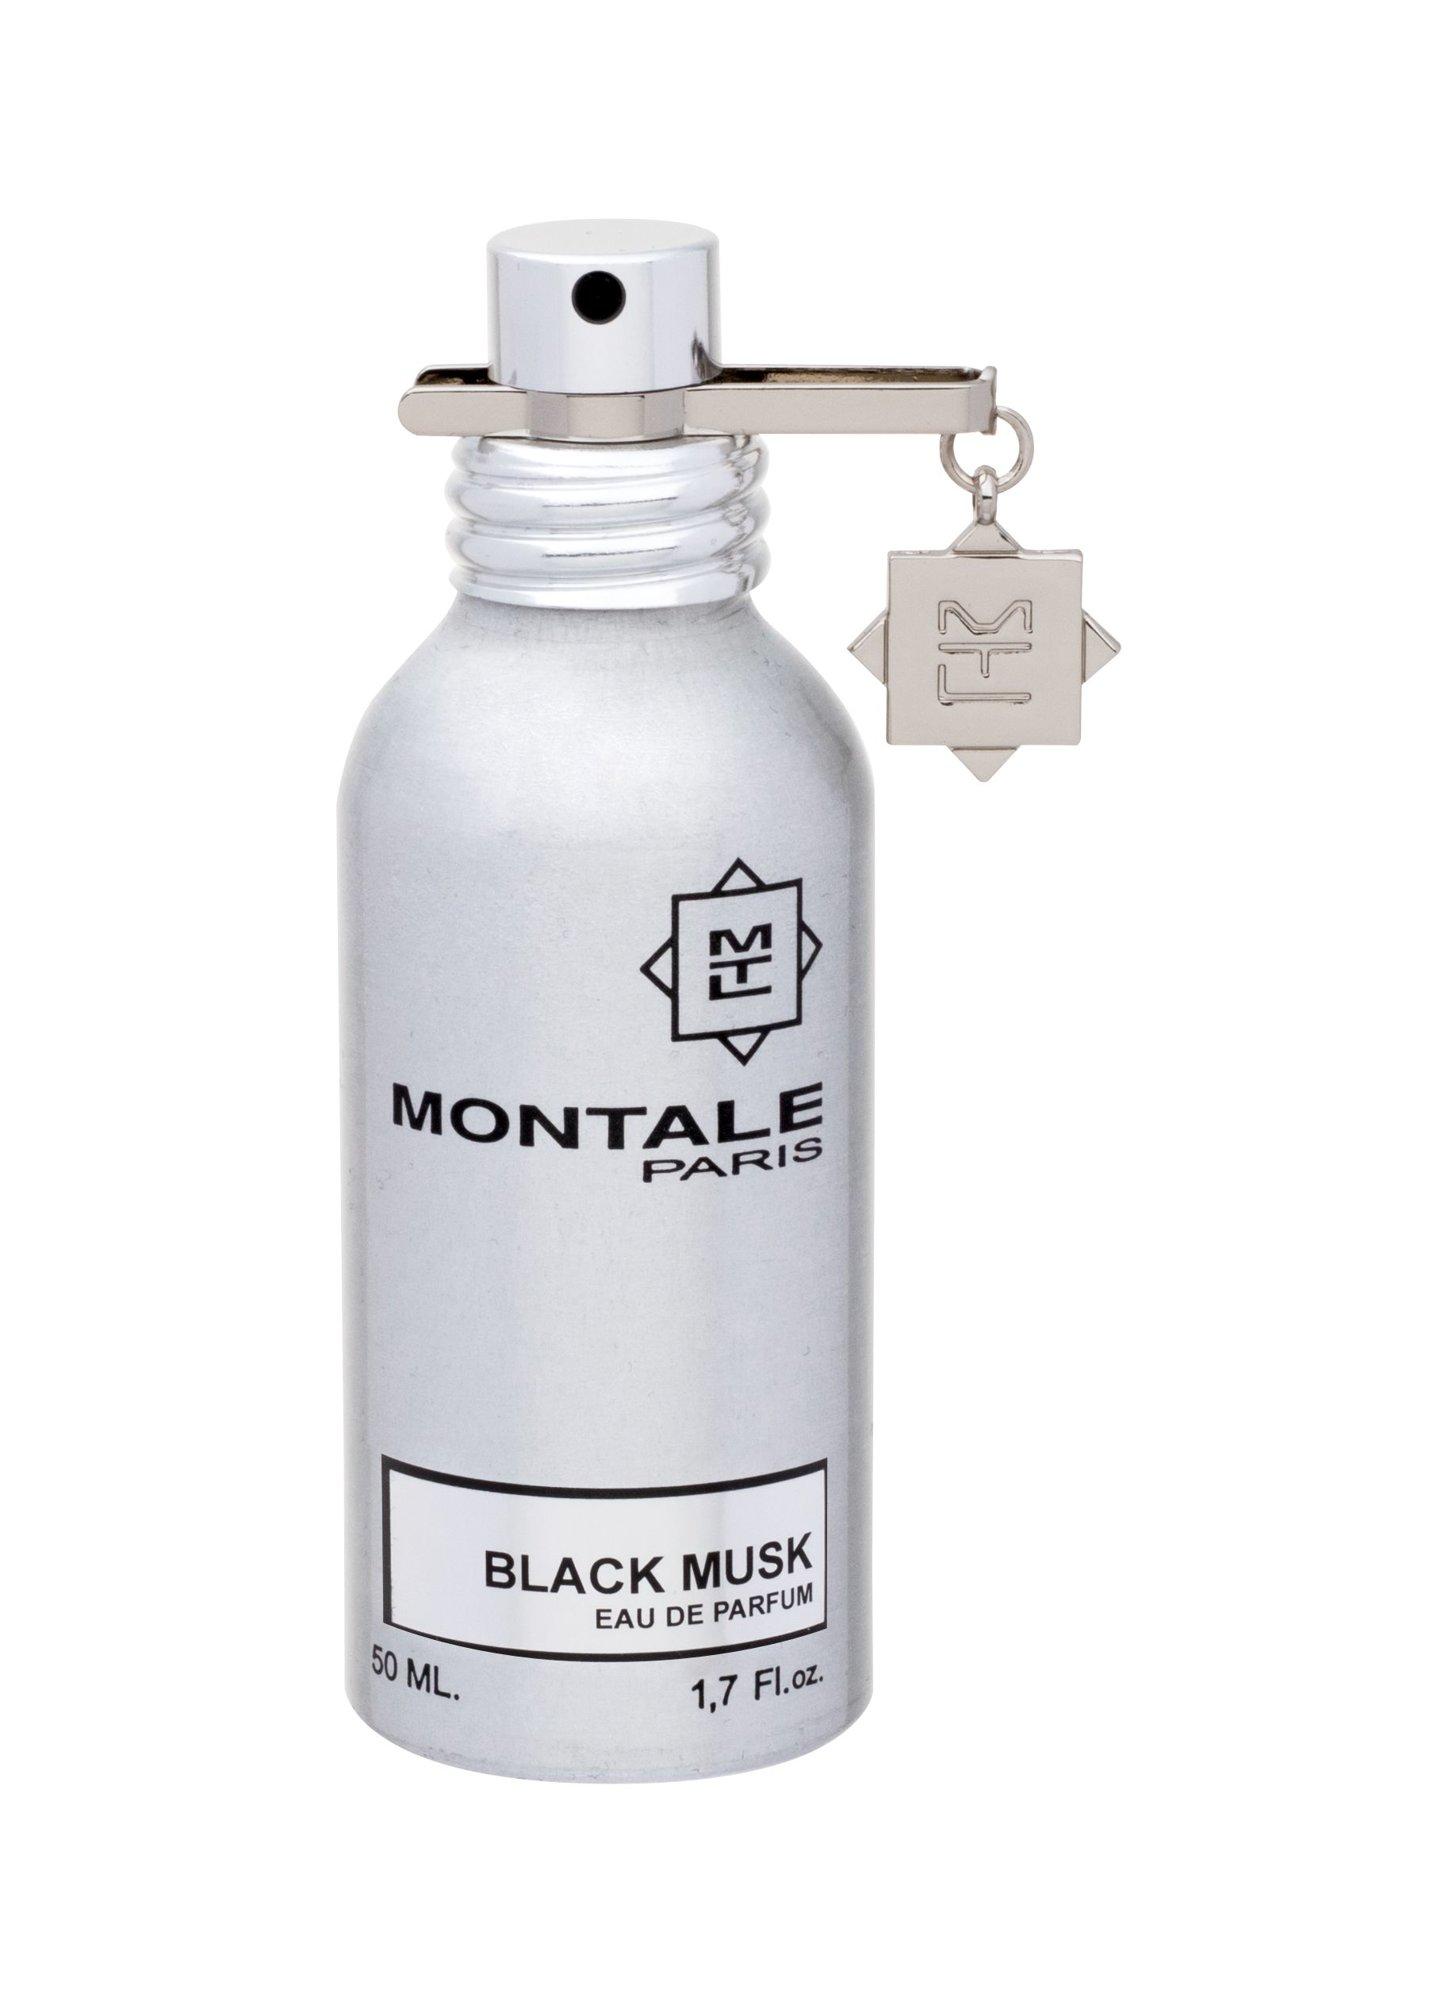 Montale Paris Black Musk EDP 50ml